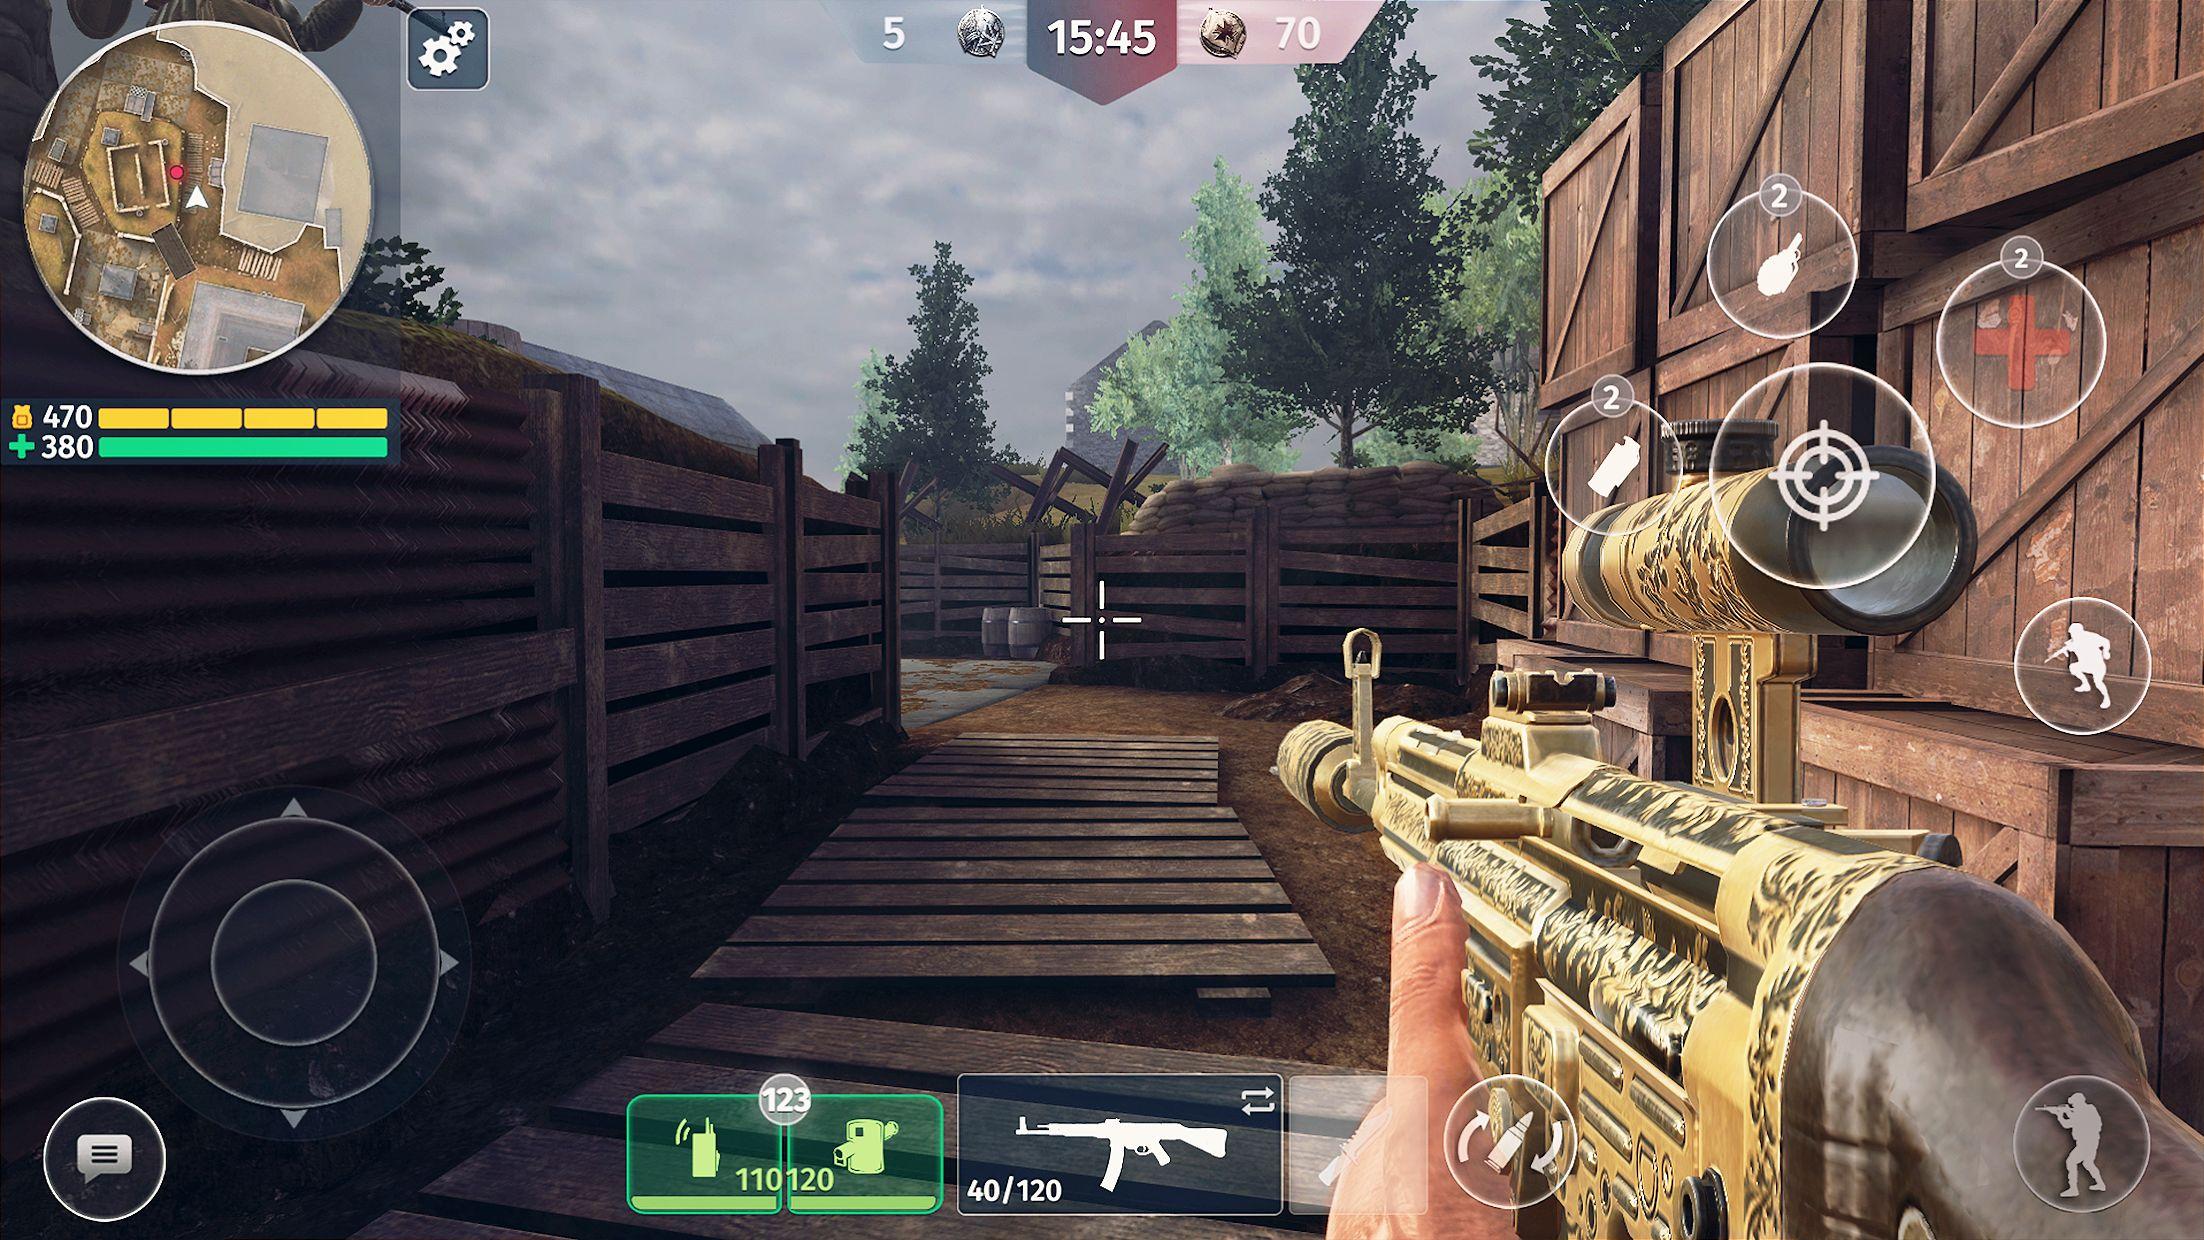 World War 2 - Battle Combat (Online FPS 游戏) 游戏截图2